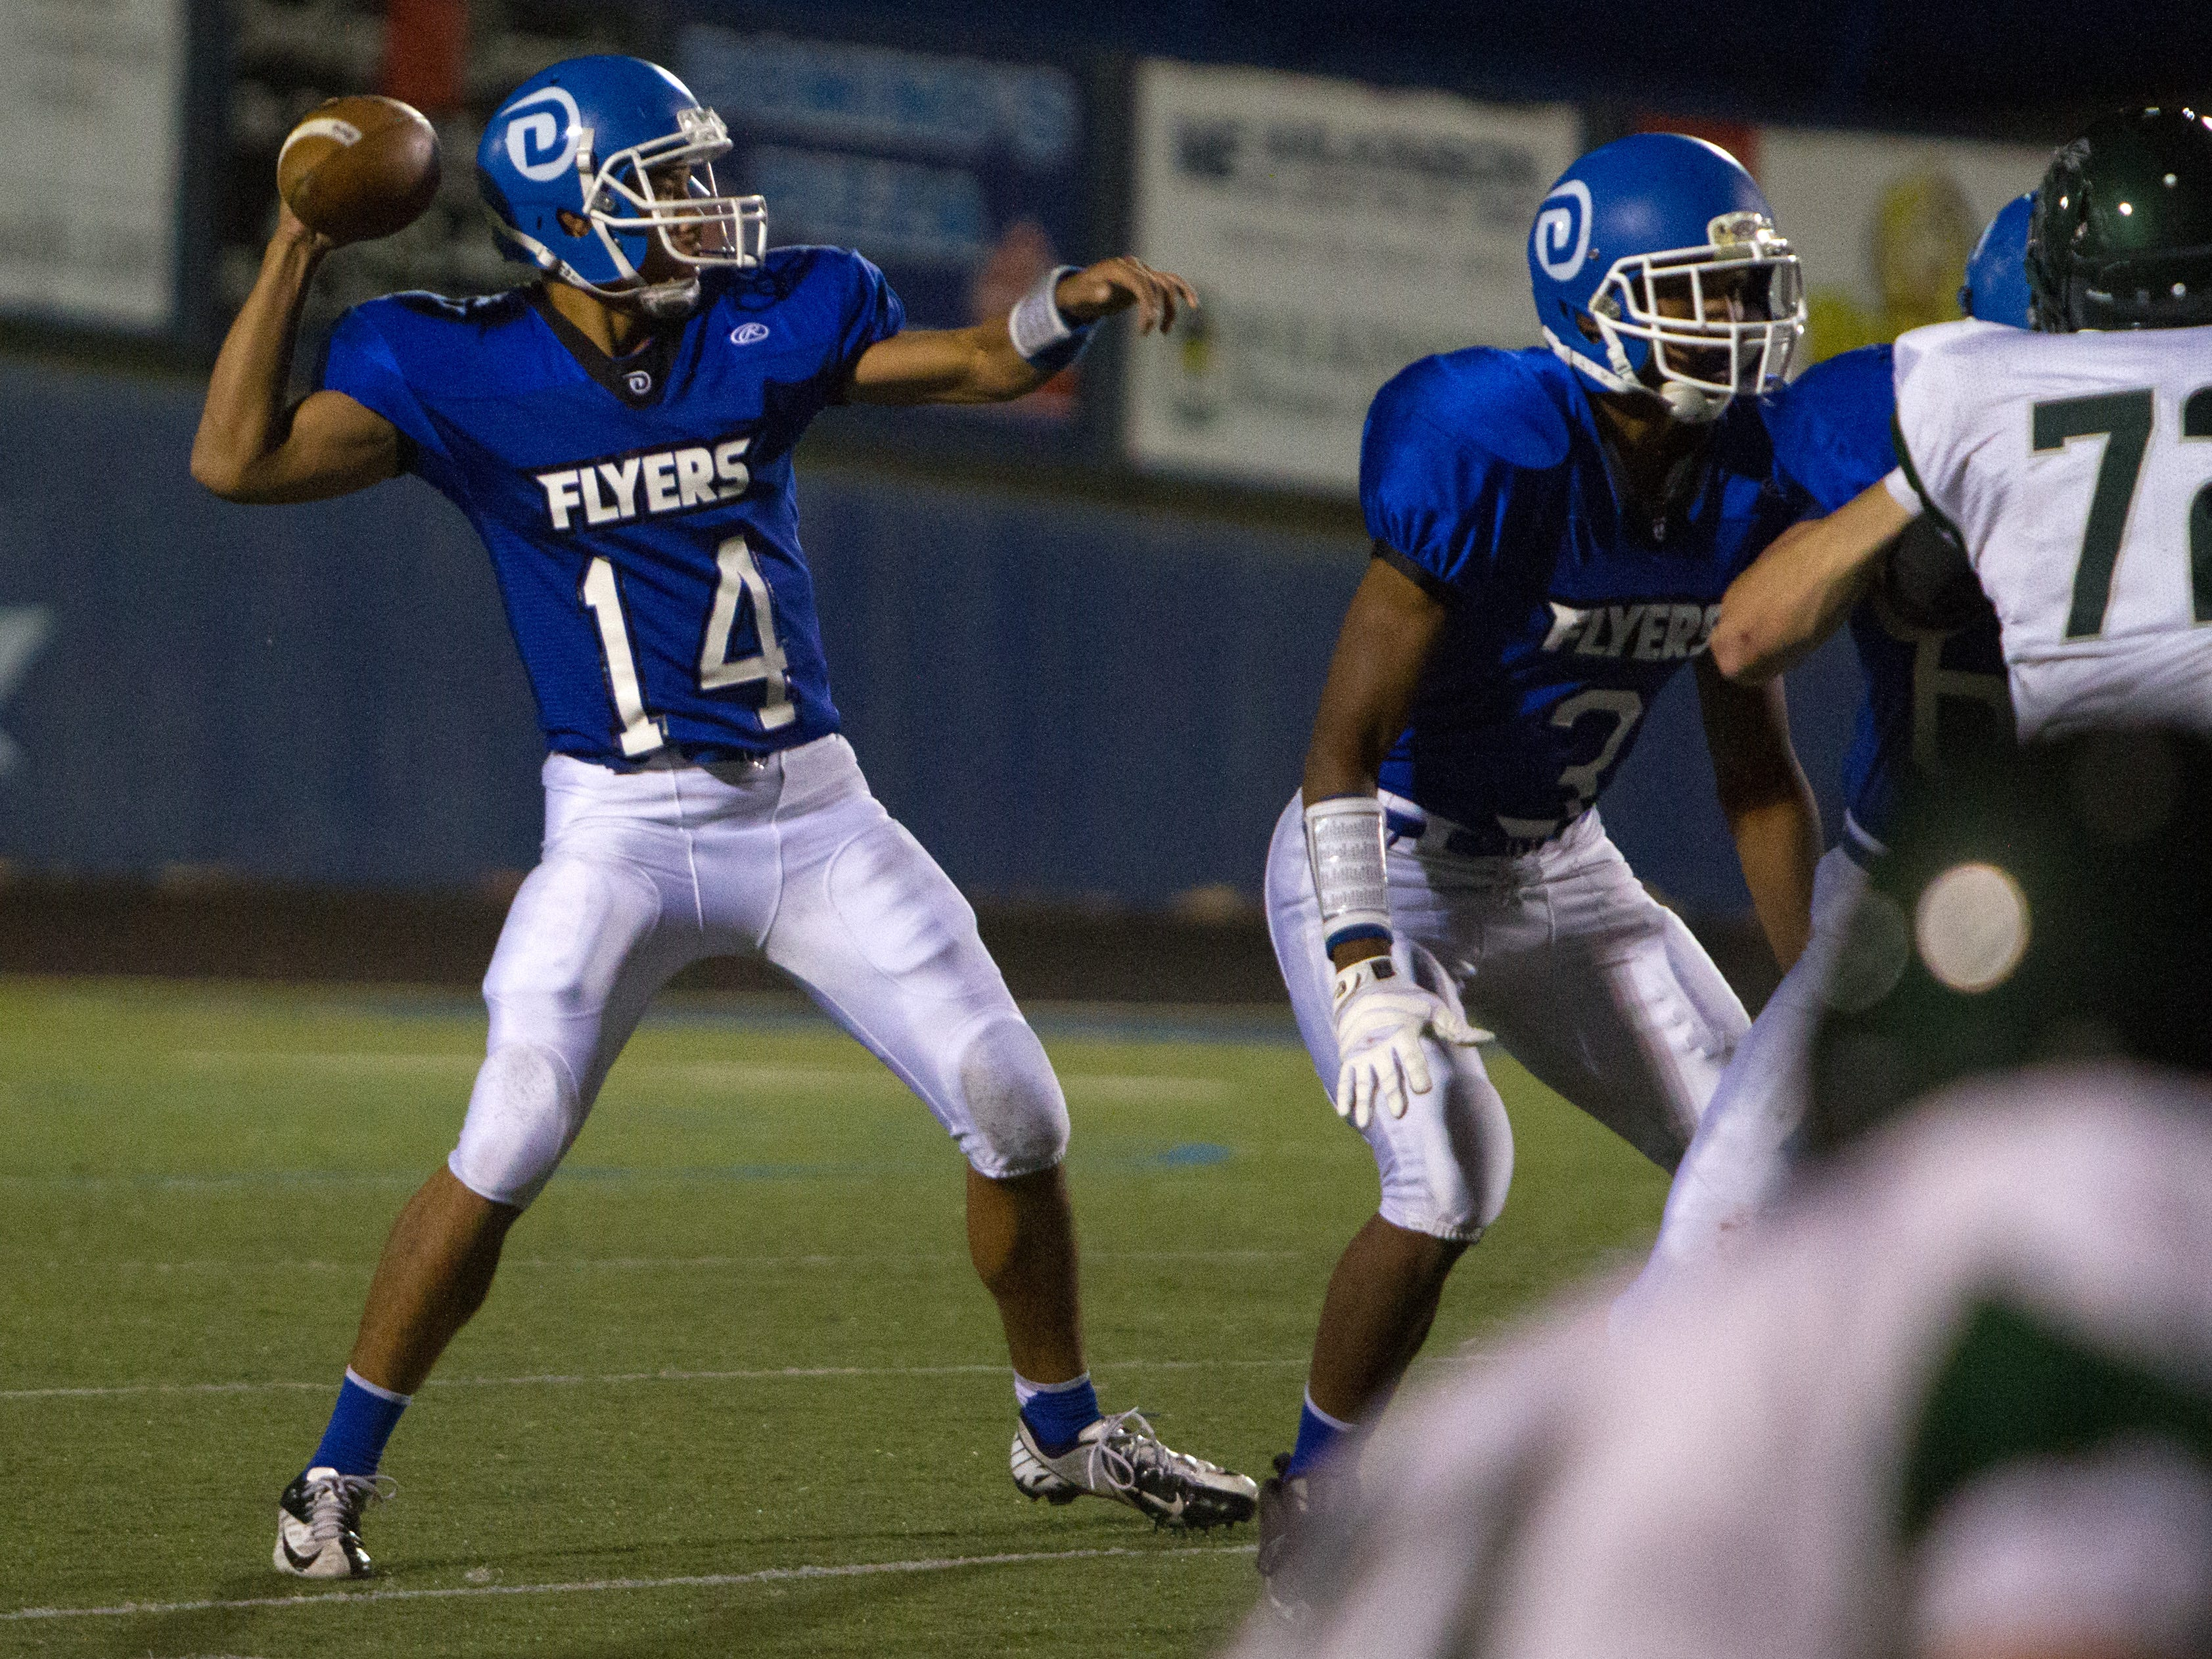 Dixie quarterback Ammon Takau hurls a pass in the first half against the Payson Lions last season.